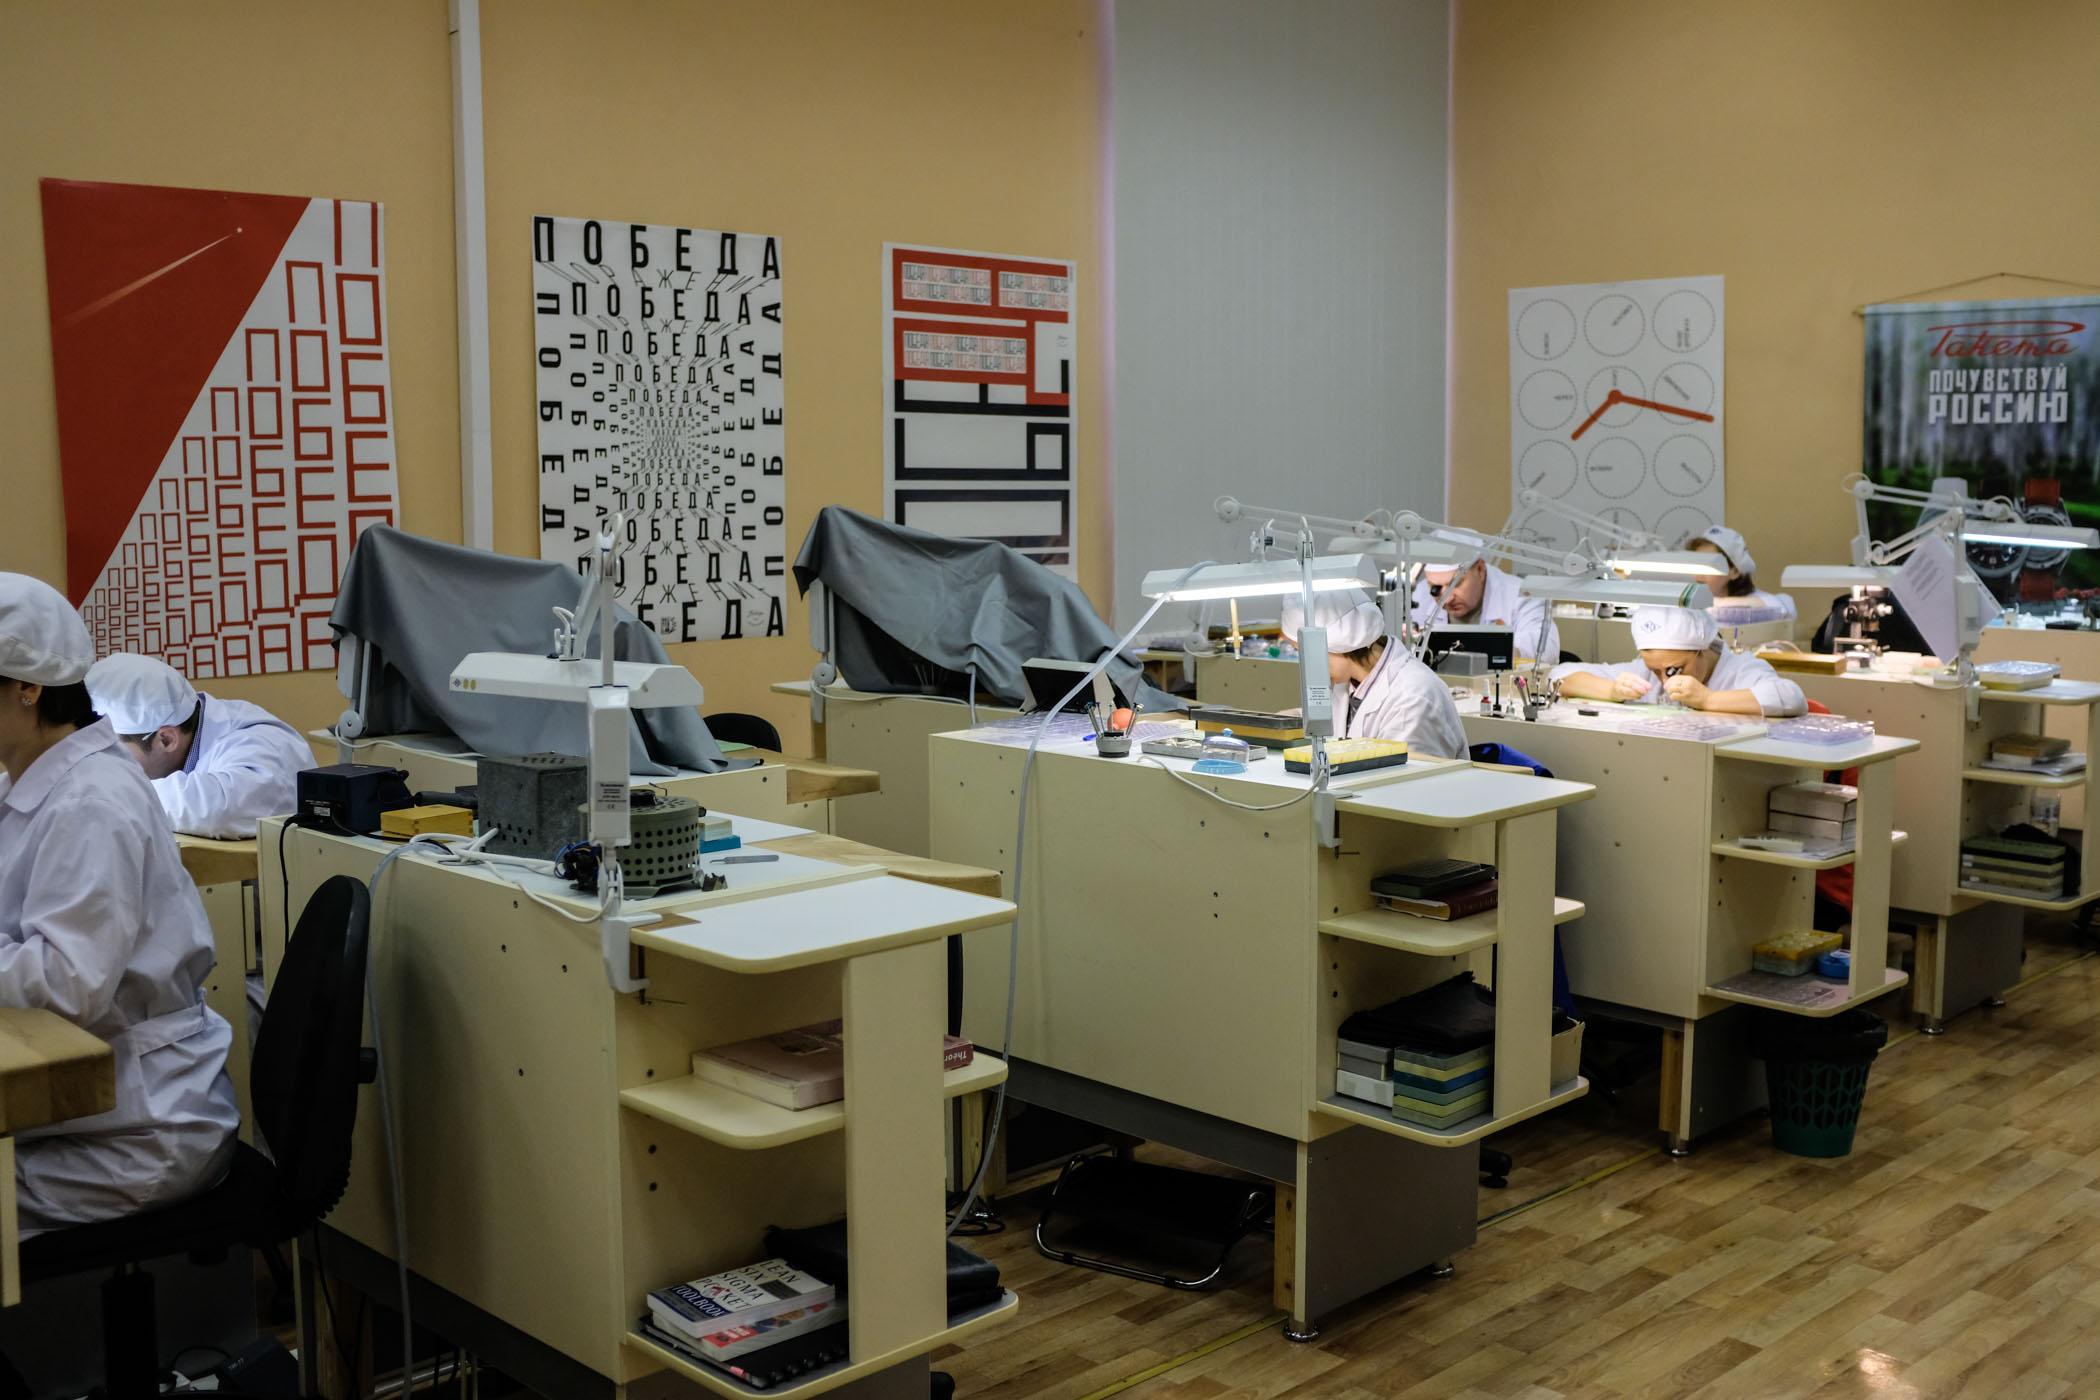 Raketa manufacture Saint petersburg Russia - 8